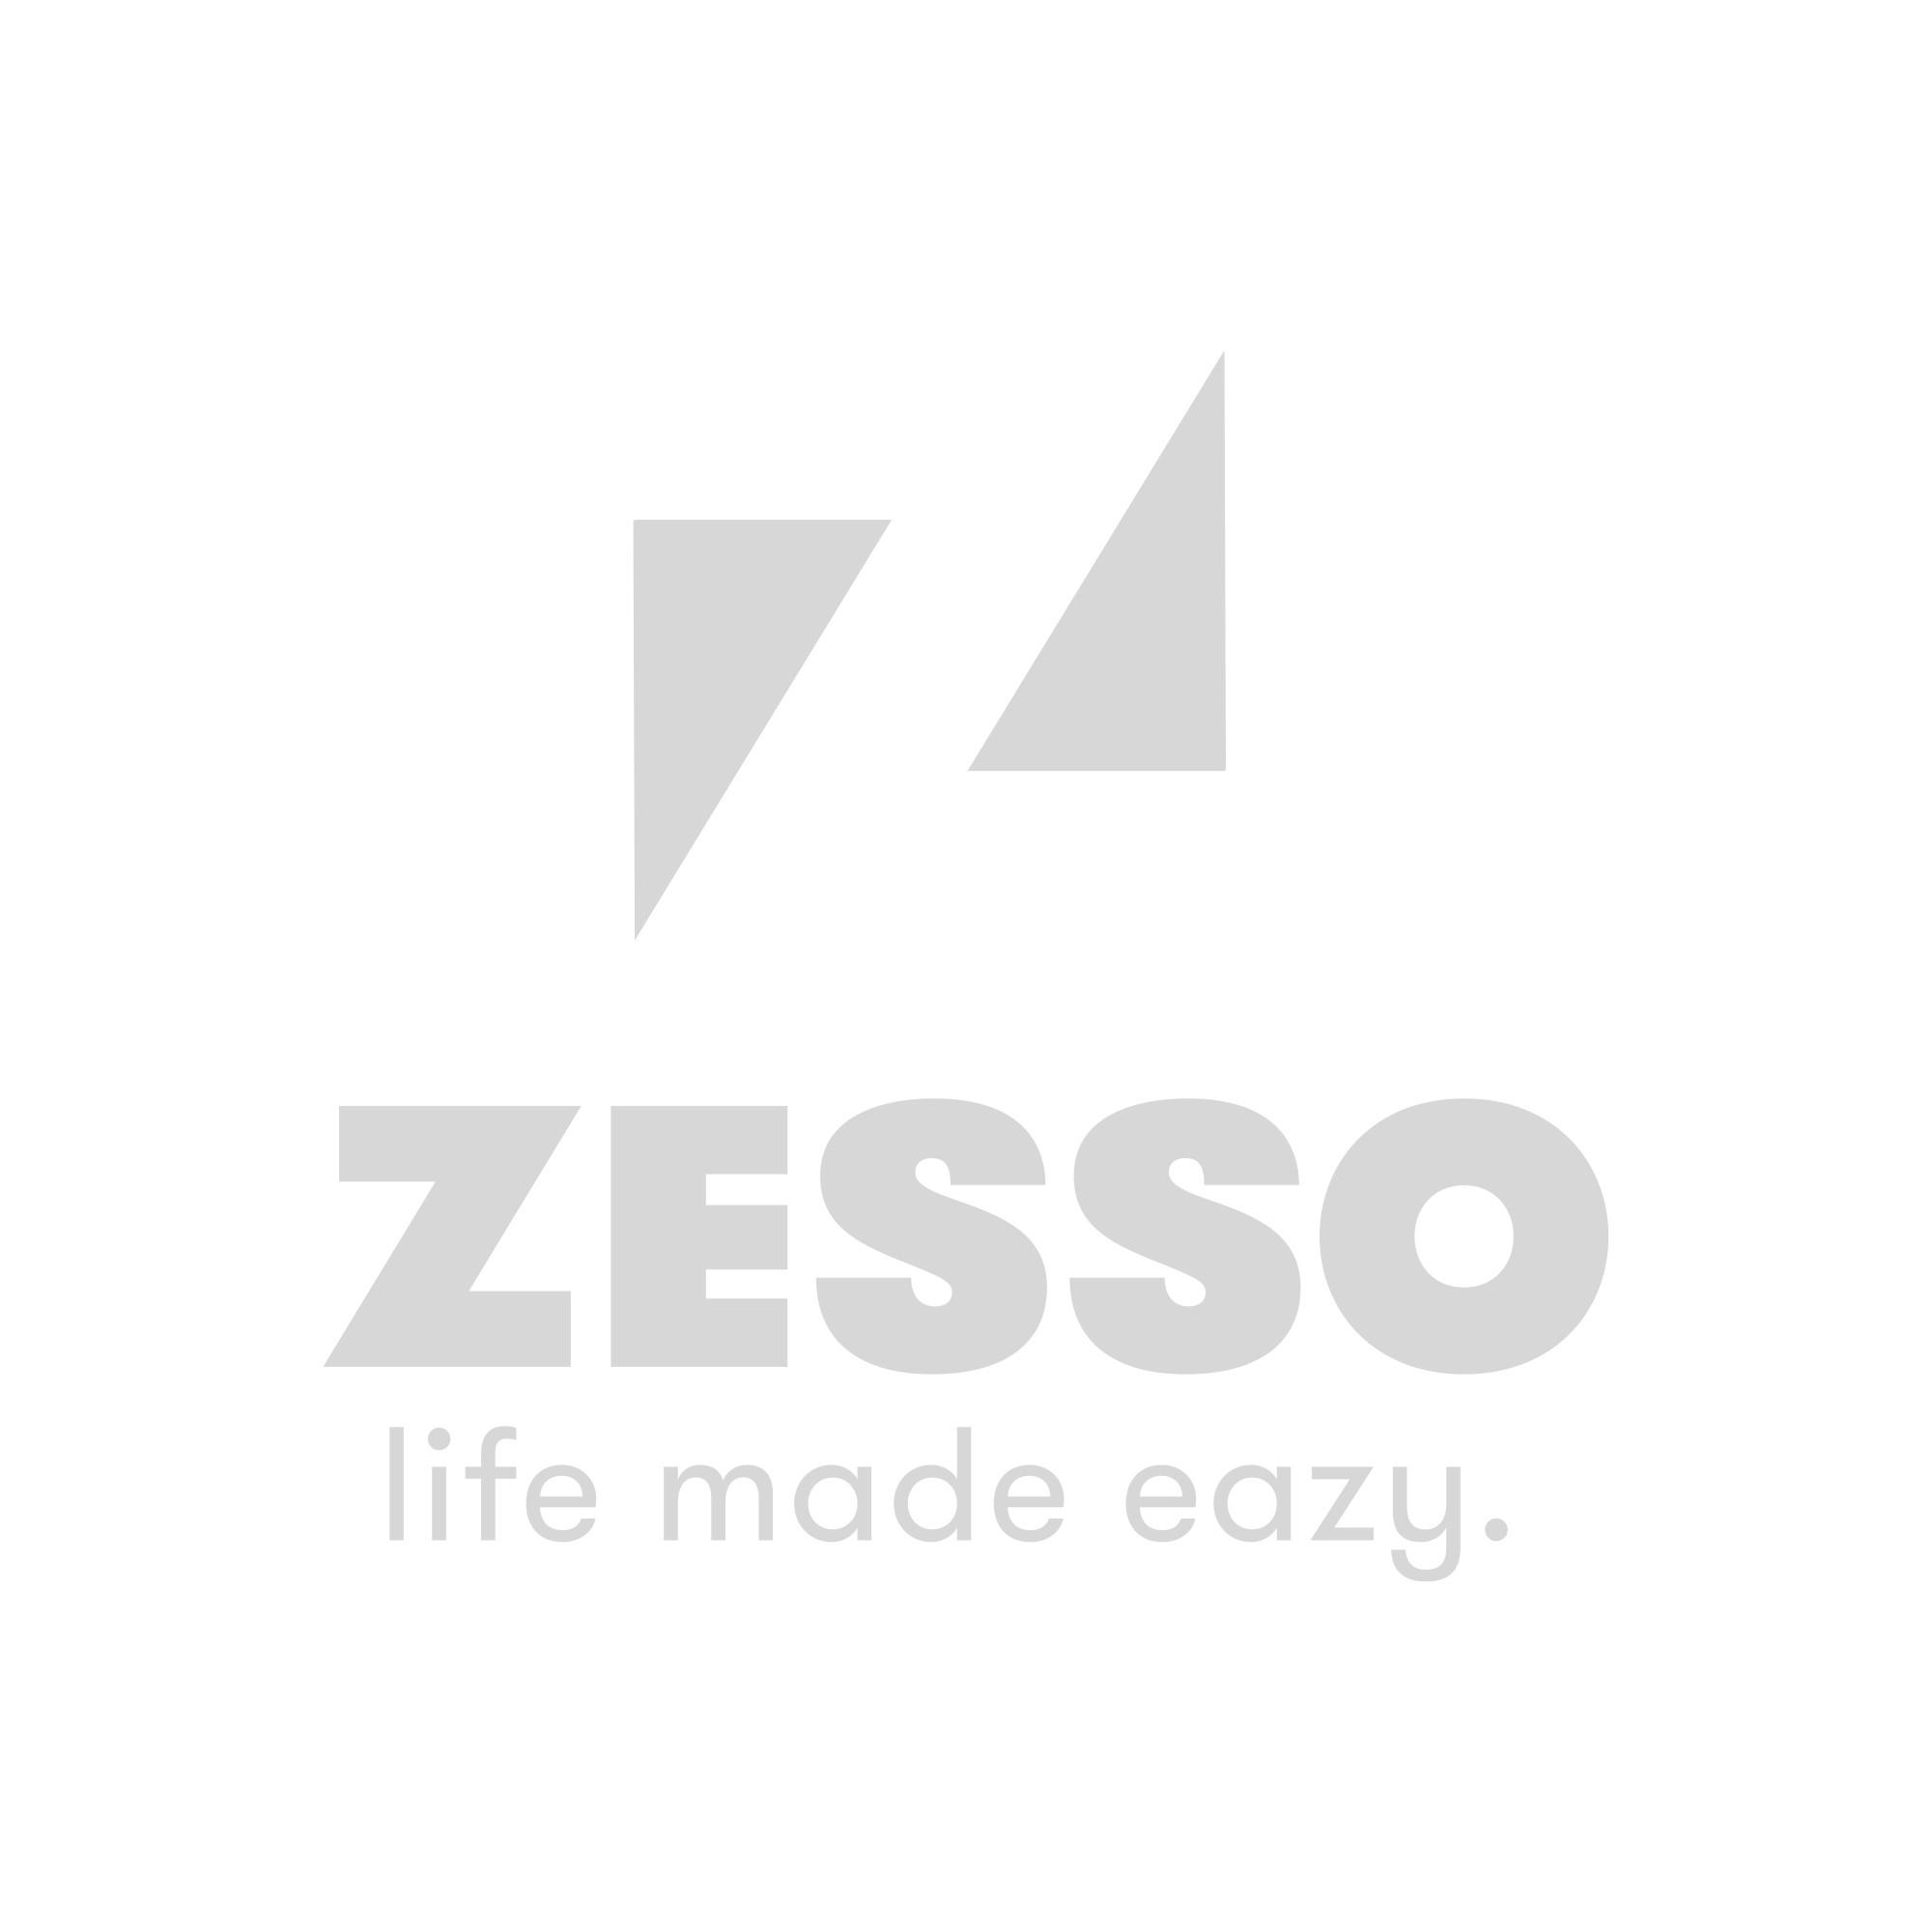 Trois Kilos Sept Bébé Pyjama 3 Mois Triangles & Stars